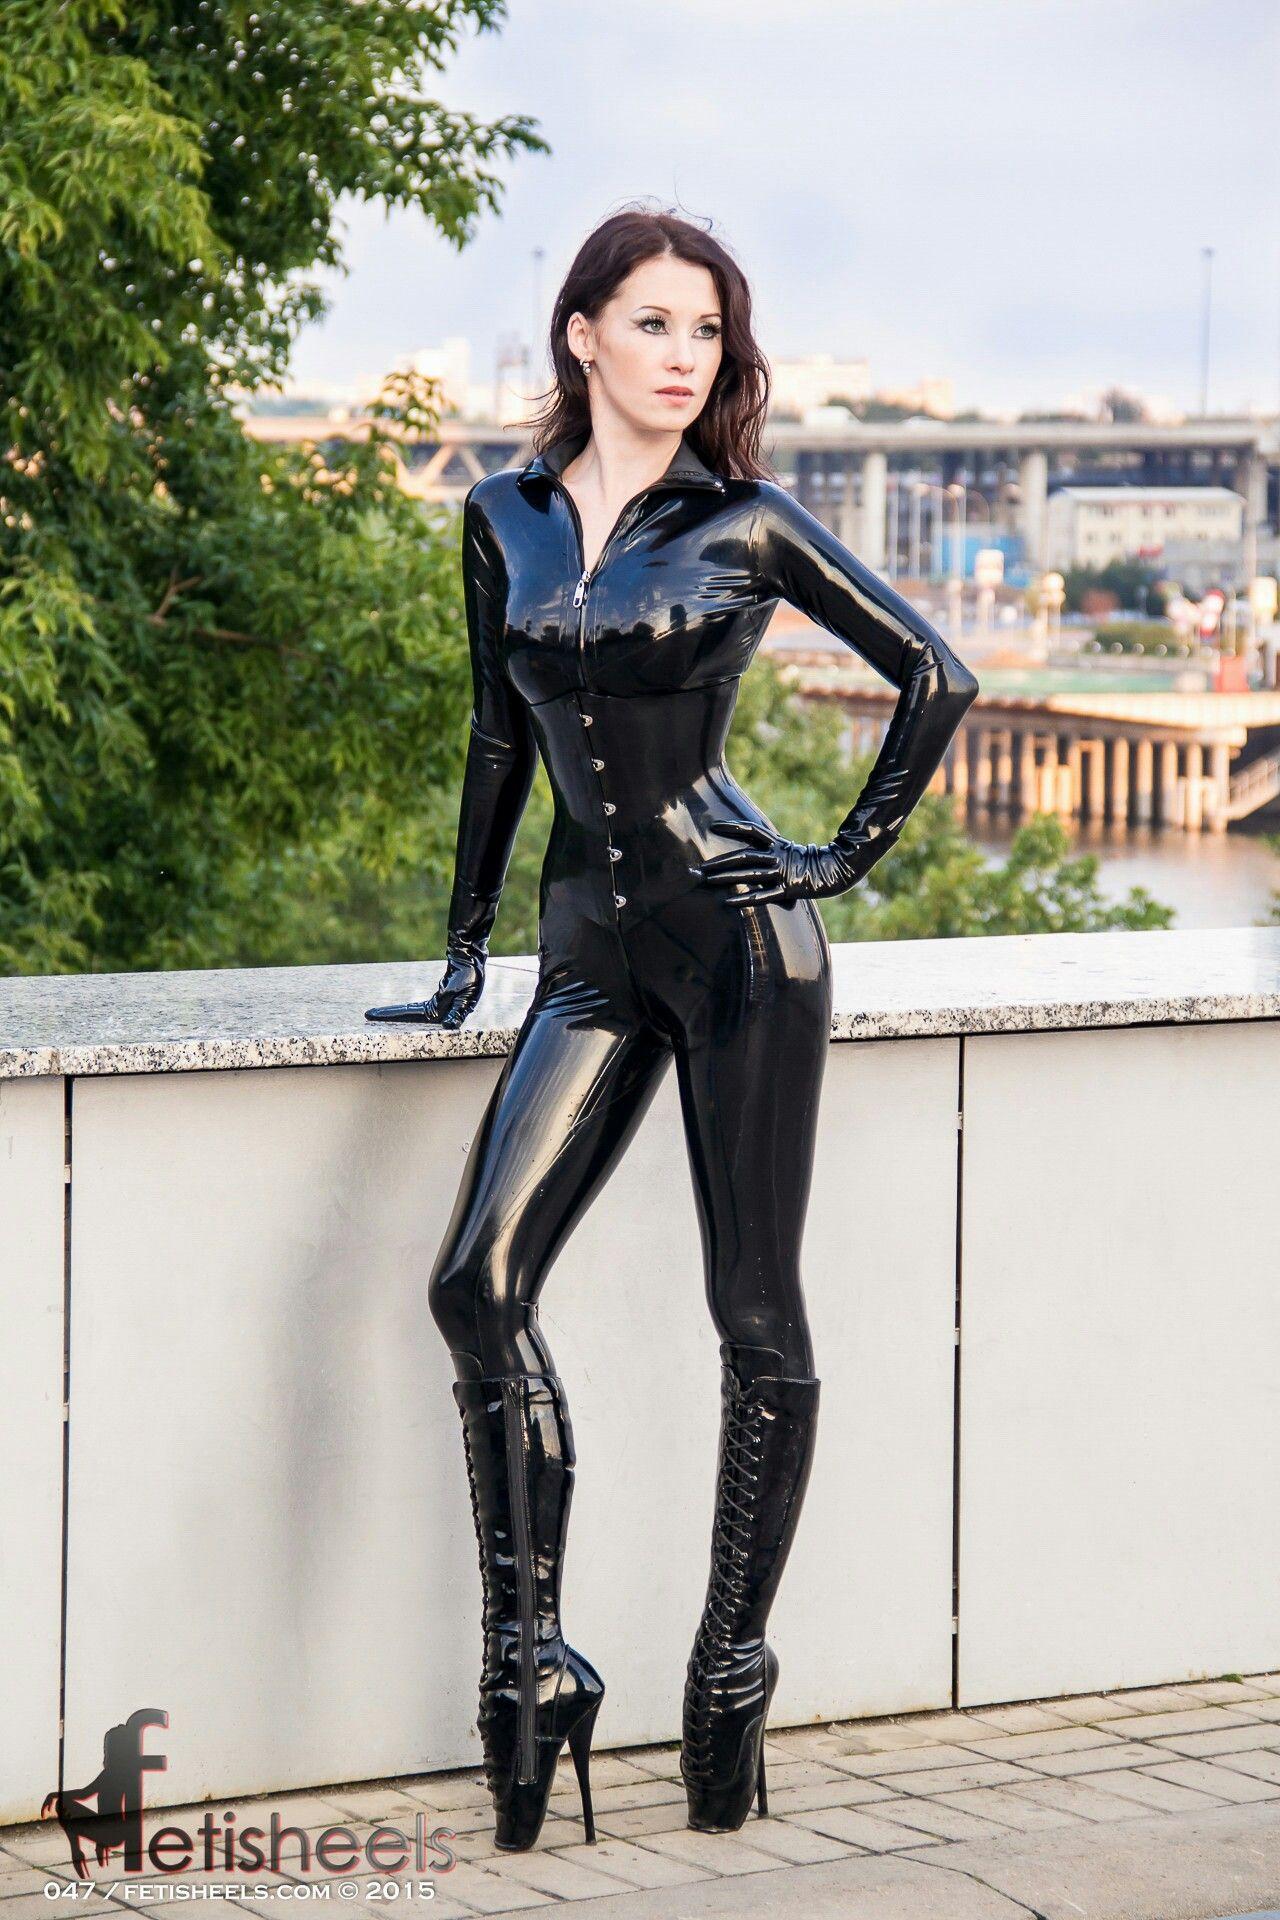 Adult Images 2020 Female latex catsuit bondage